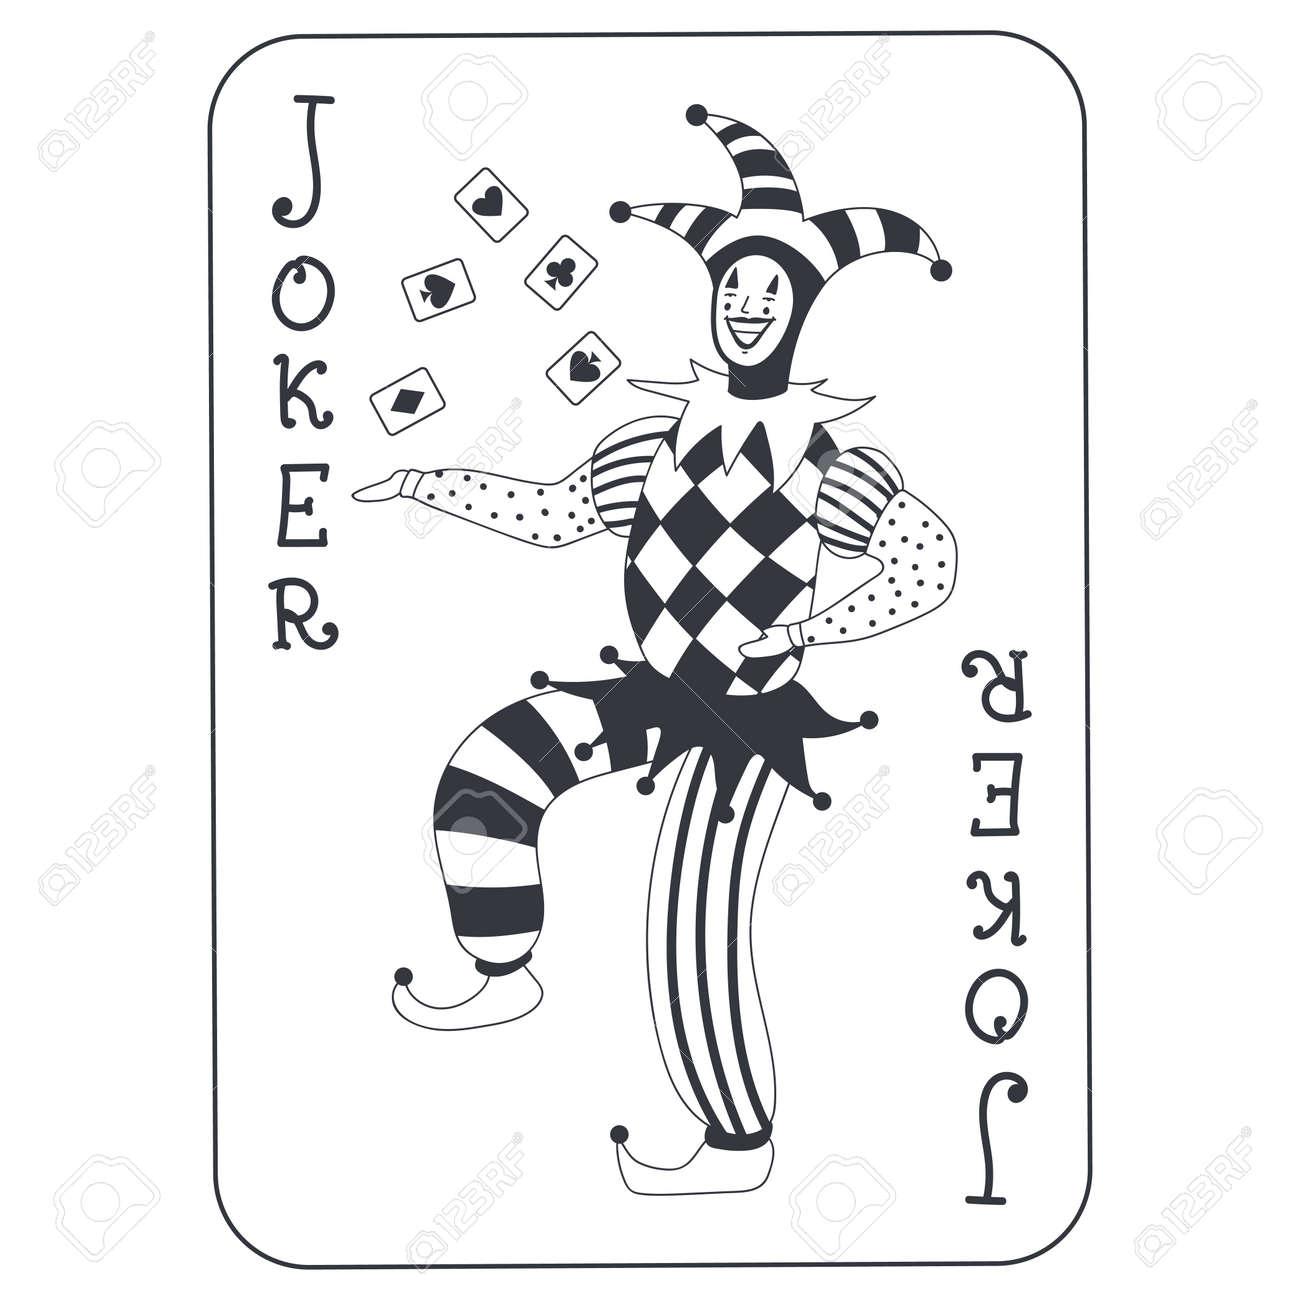 Joker poker card vector cartoon illustration isolated on white background. - 173241347